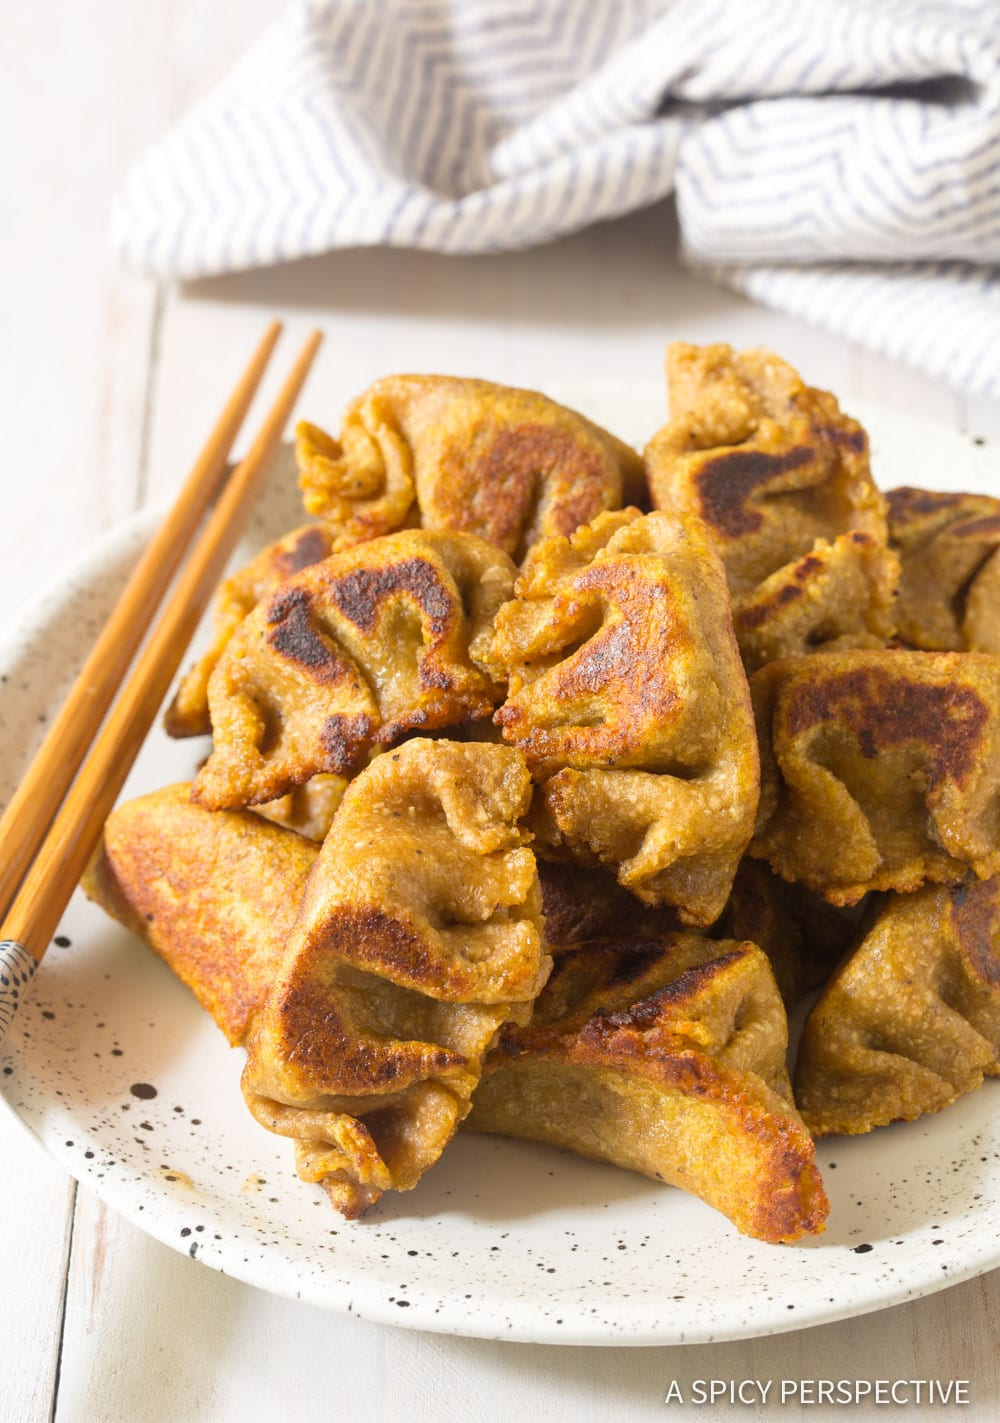 Best Paleo Chinese Dumplings Recipe (Potstickers) #ASpicyPerspective #grainfree #dairyfree